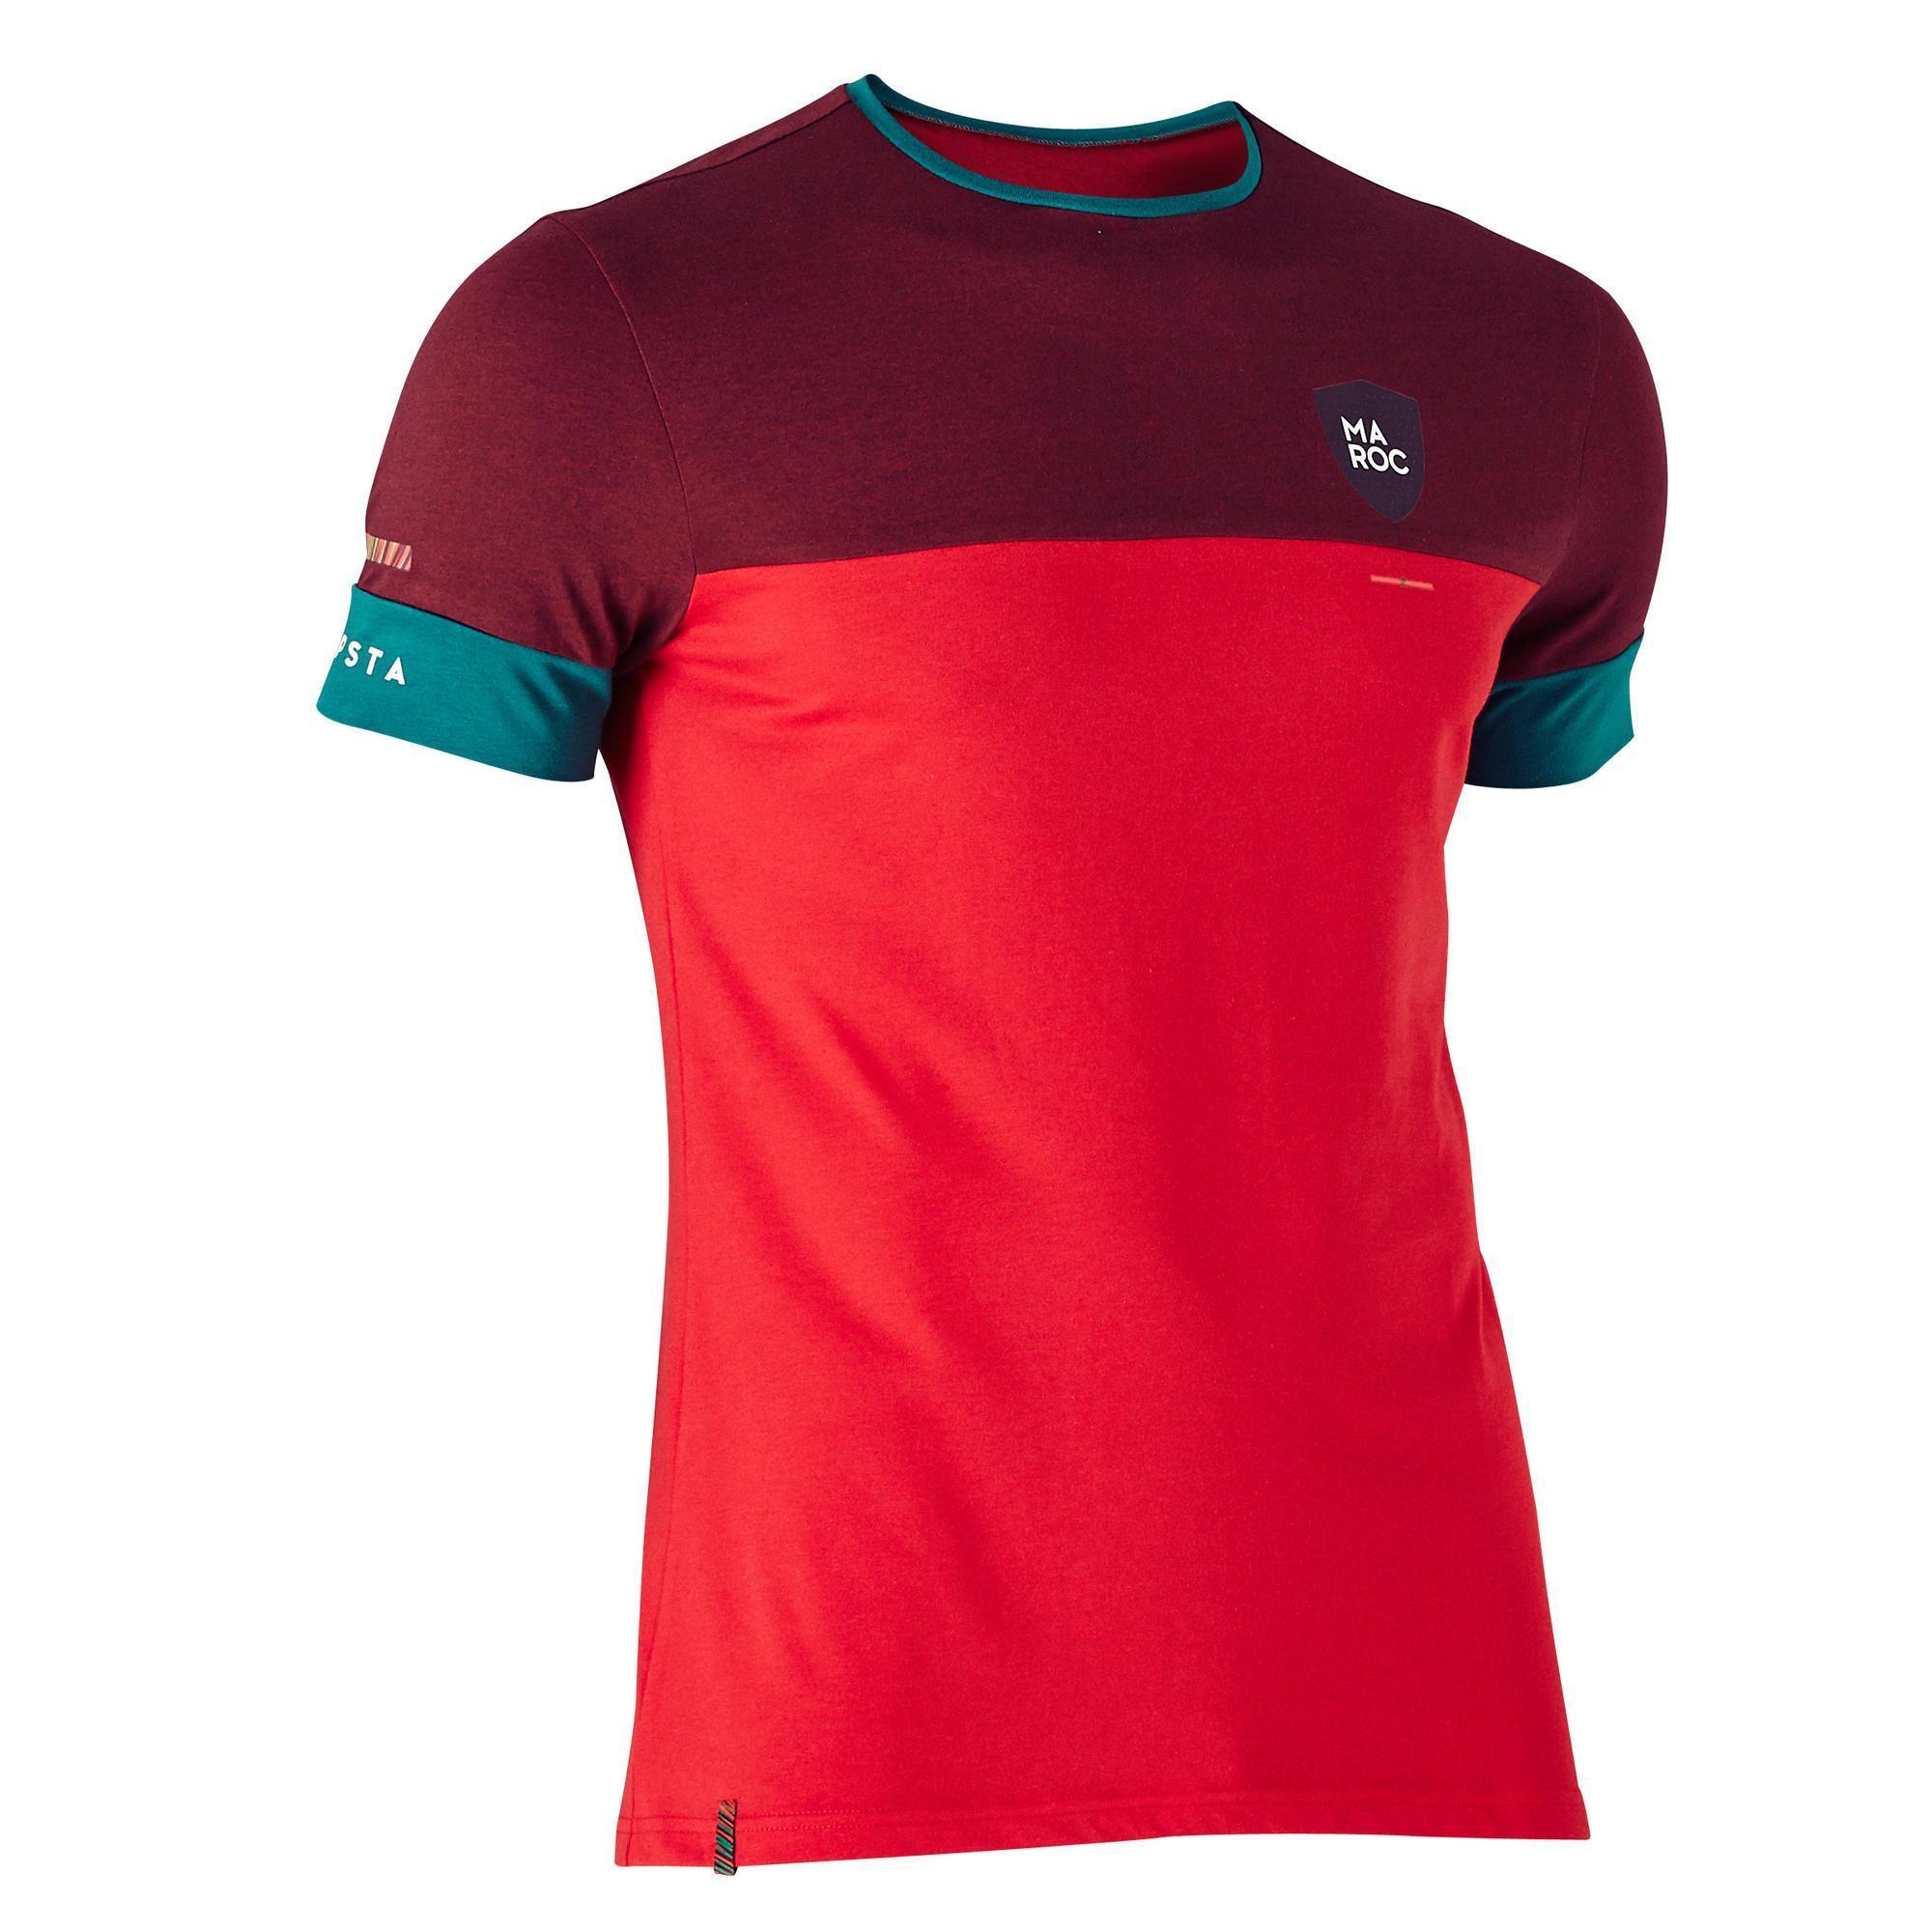 T-Shirt de Football Kipsta Maroc